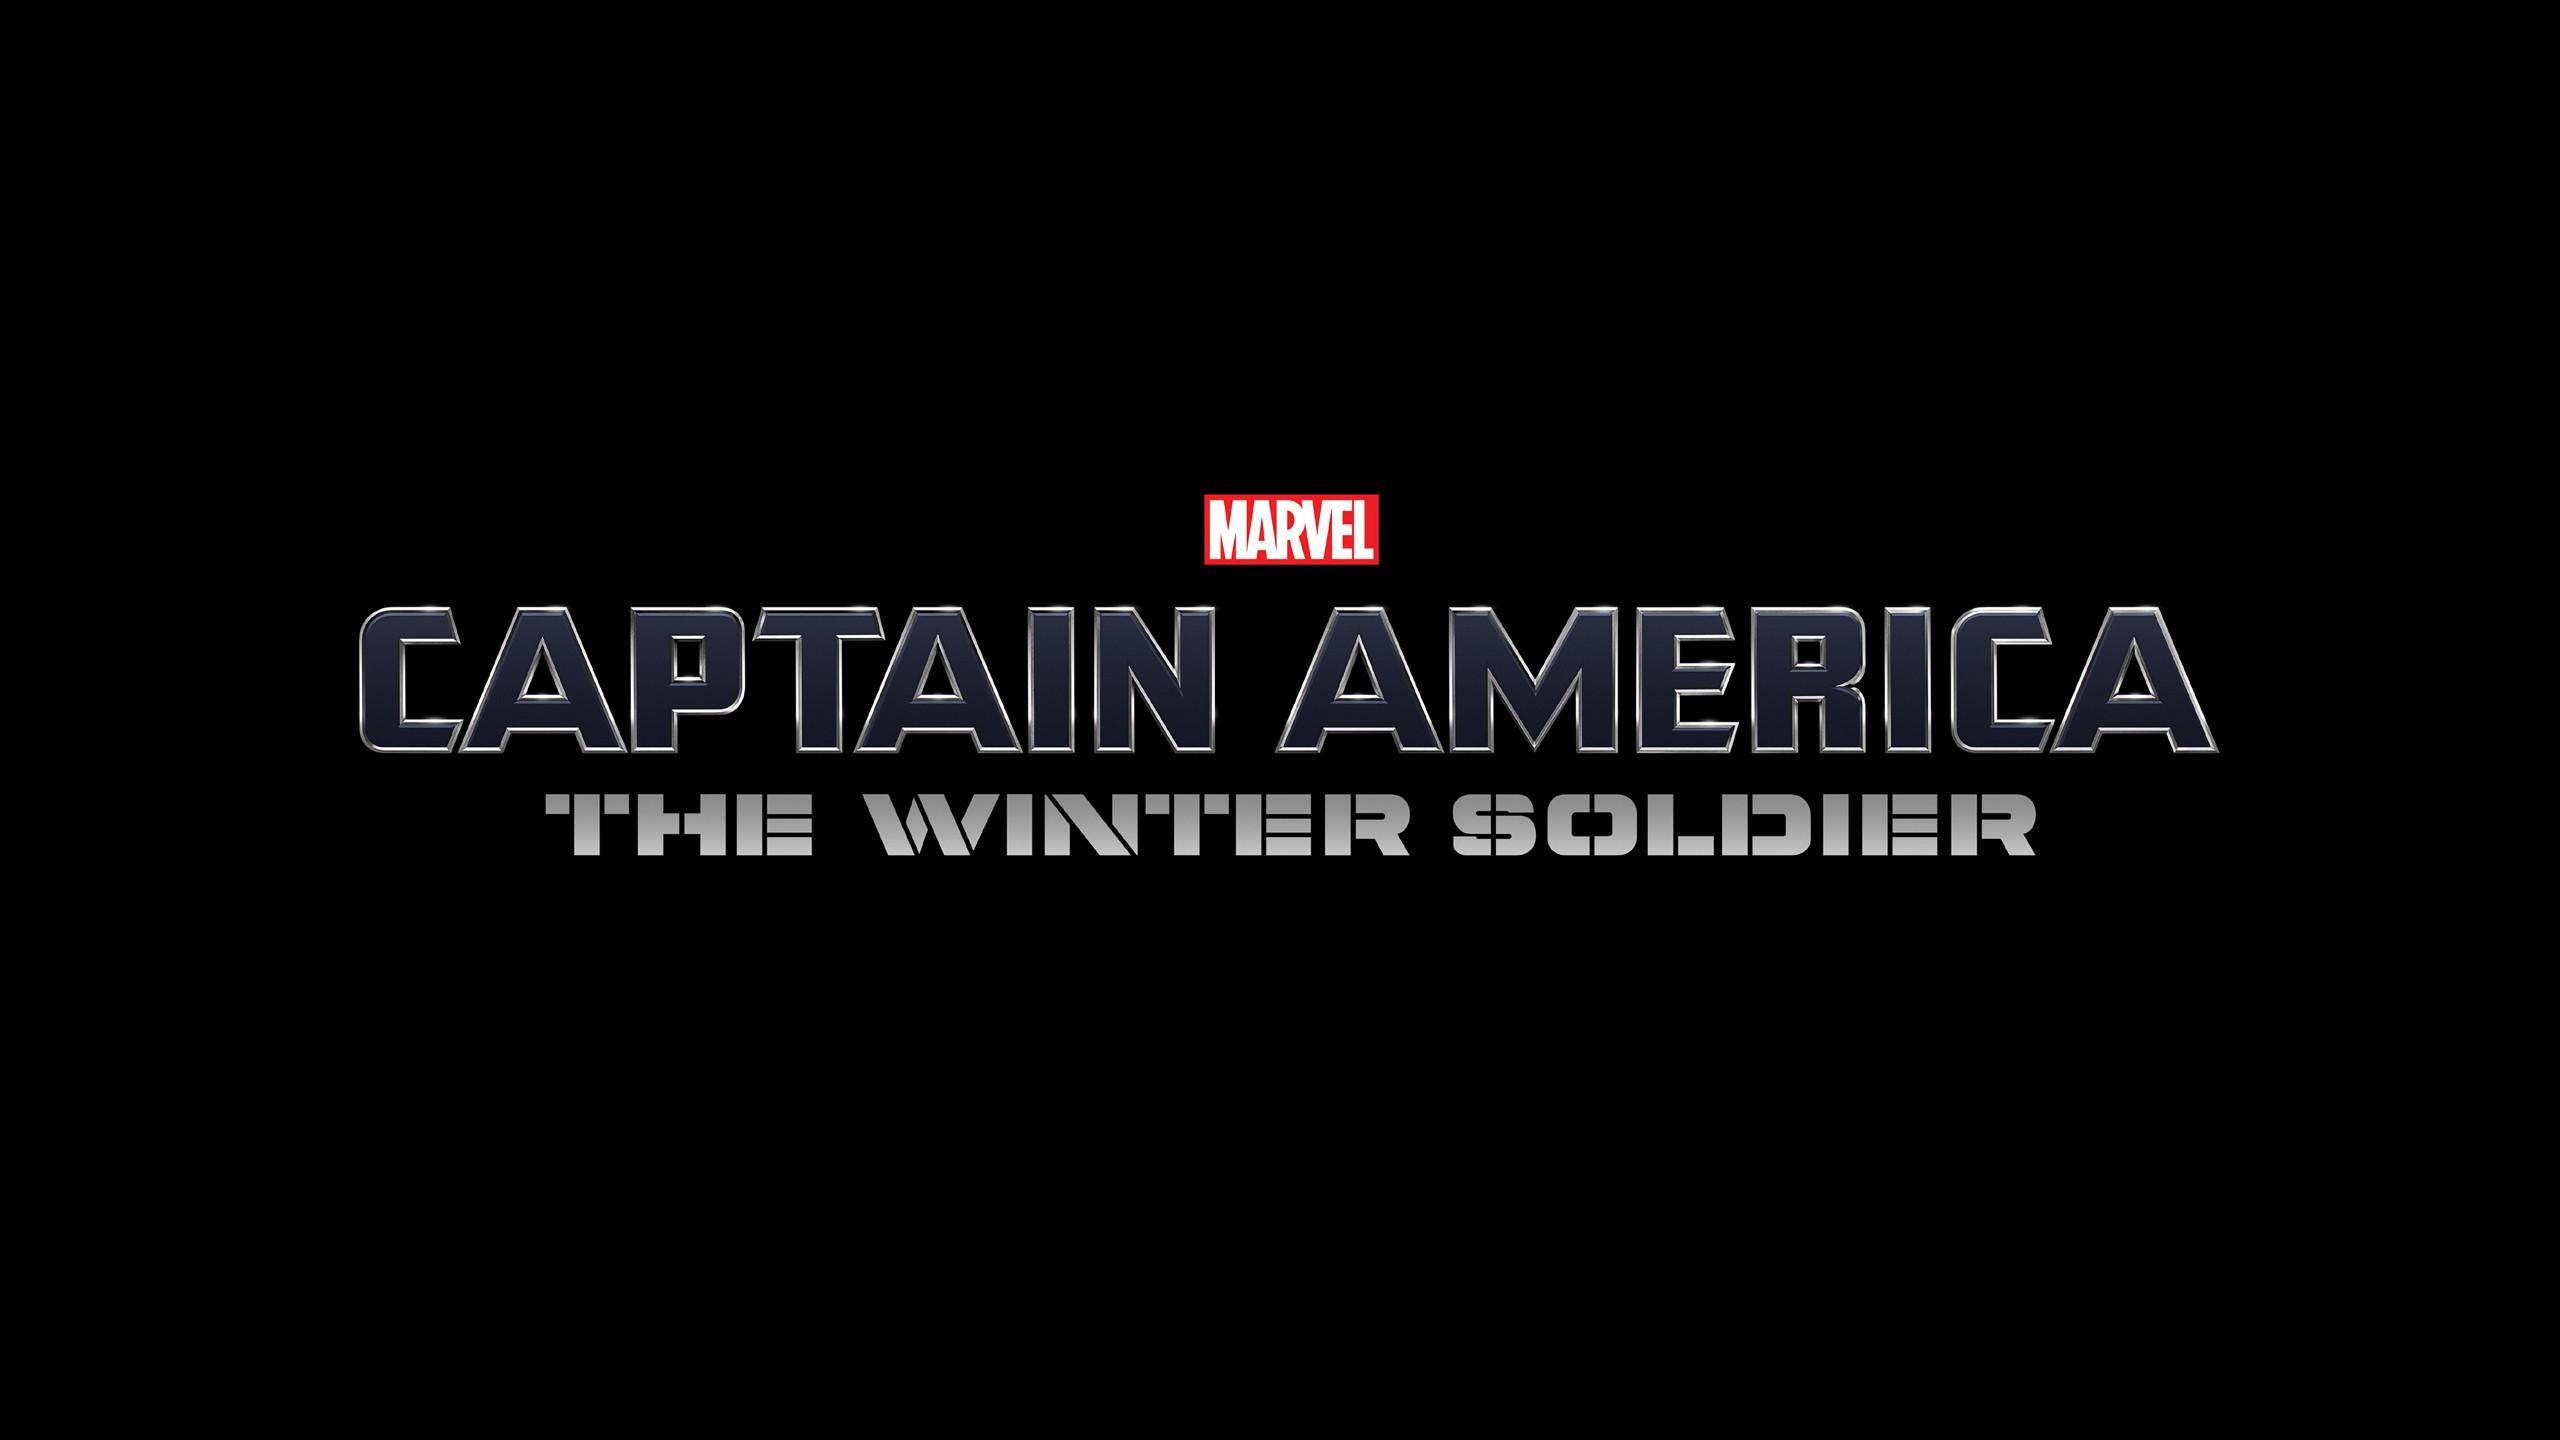 captain america winter soldier logo wallpaper 46291